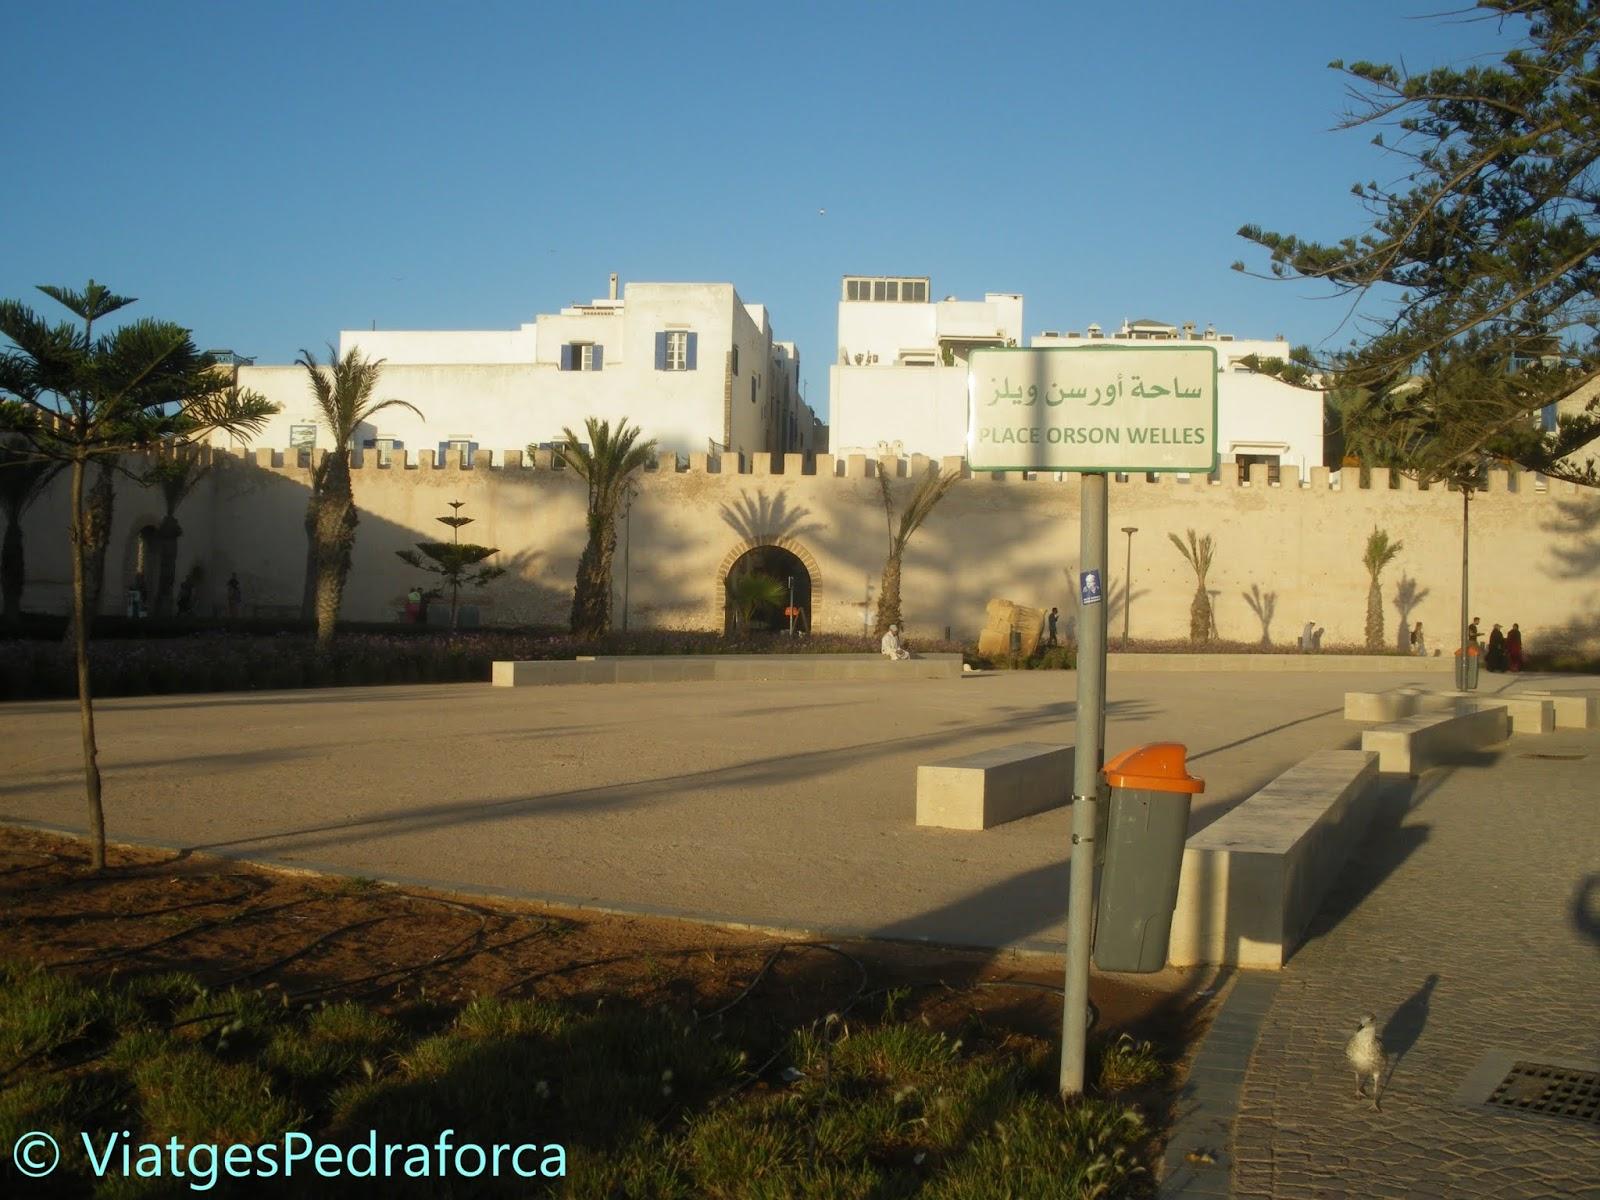 marroc, Patrimoni de la humanitat, Unesco Heritage, medina d'Essaouira